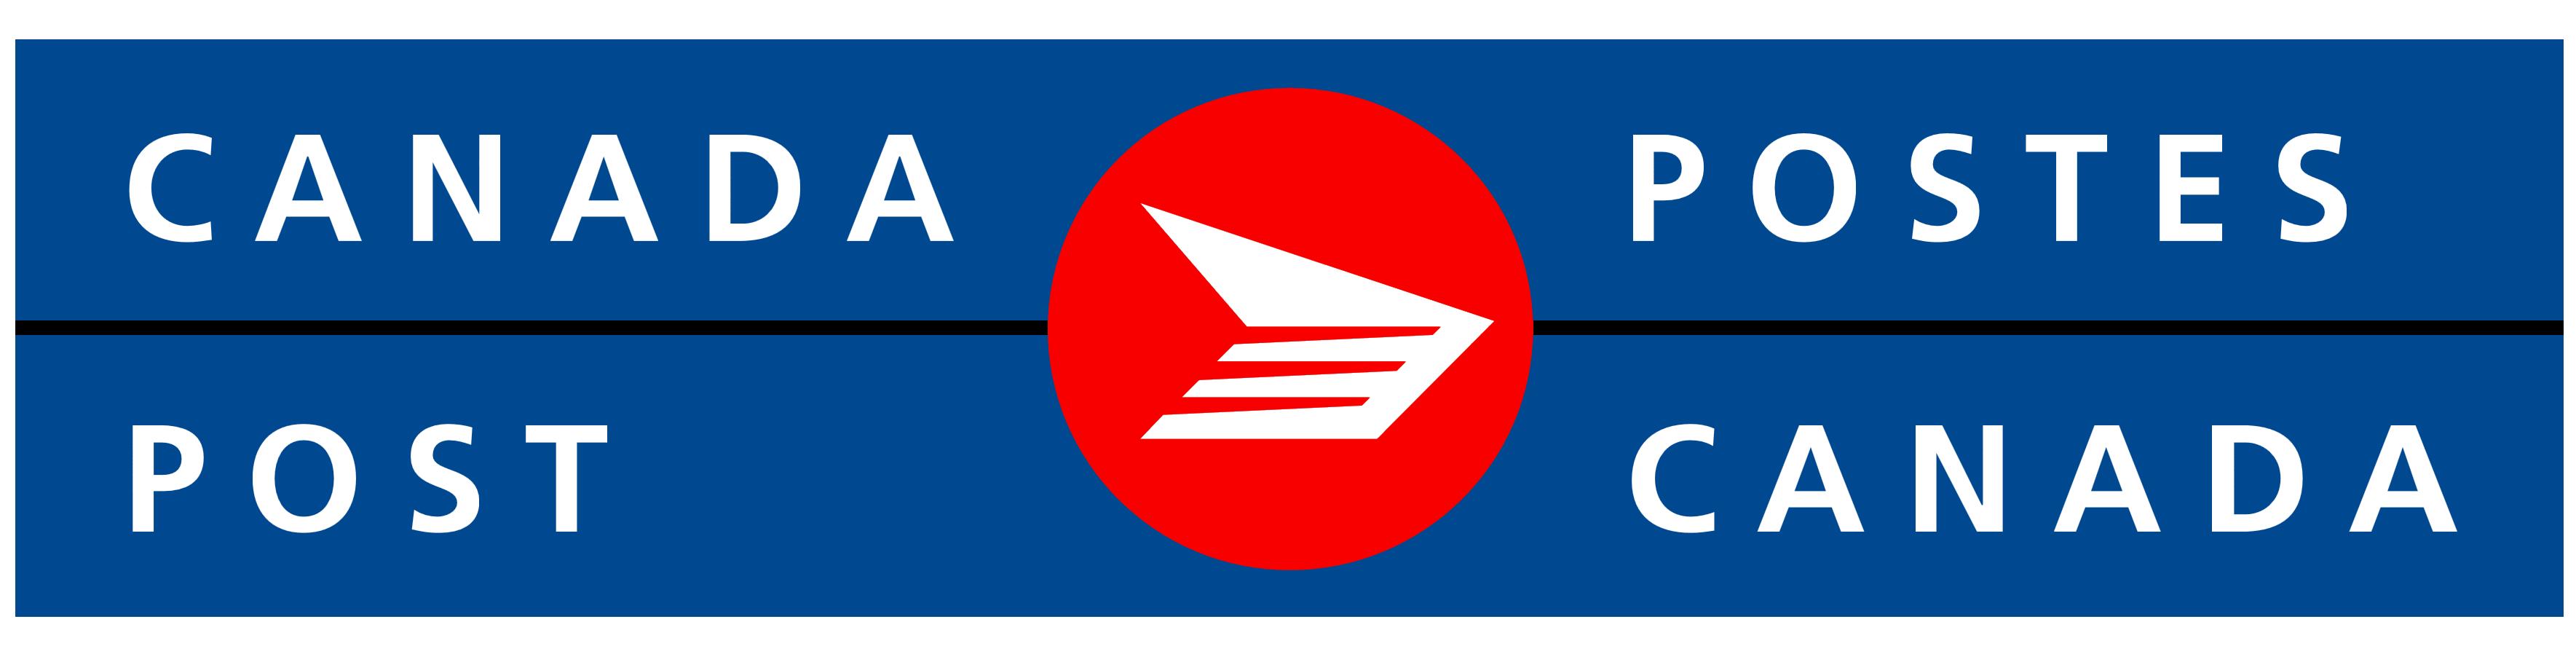 canada international postage